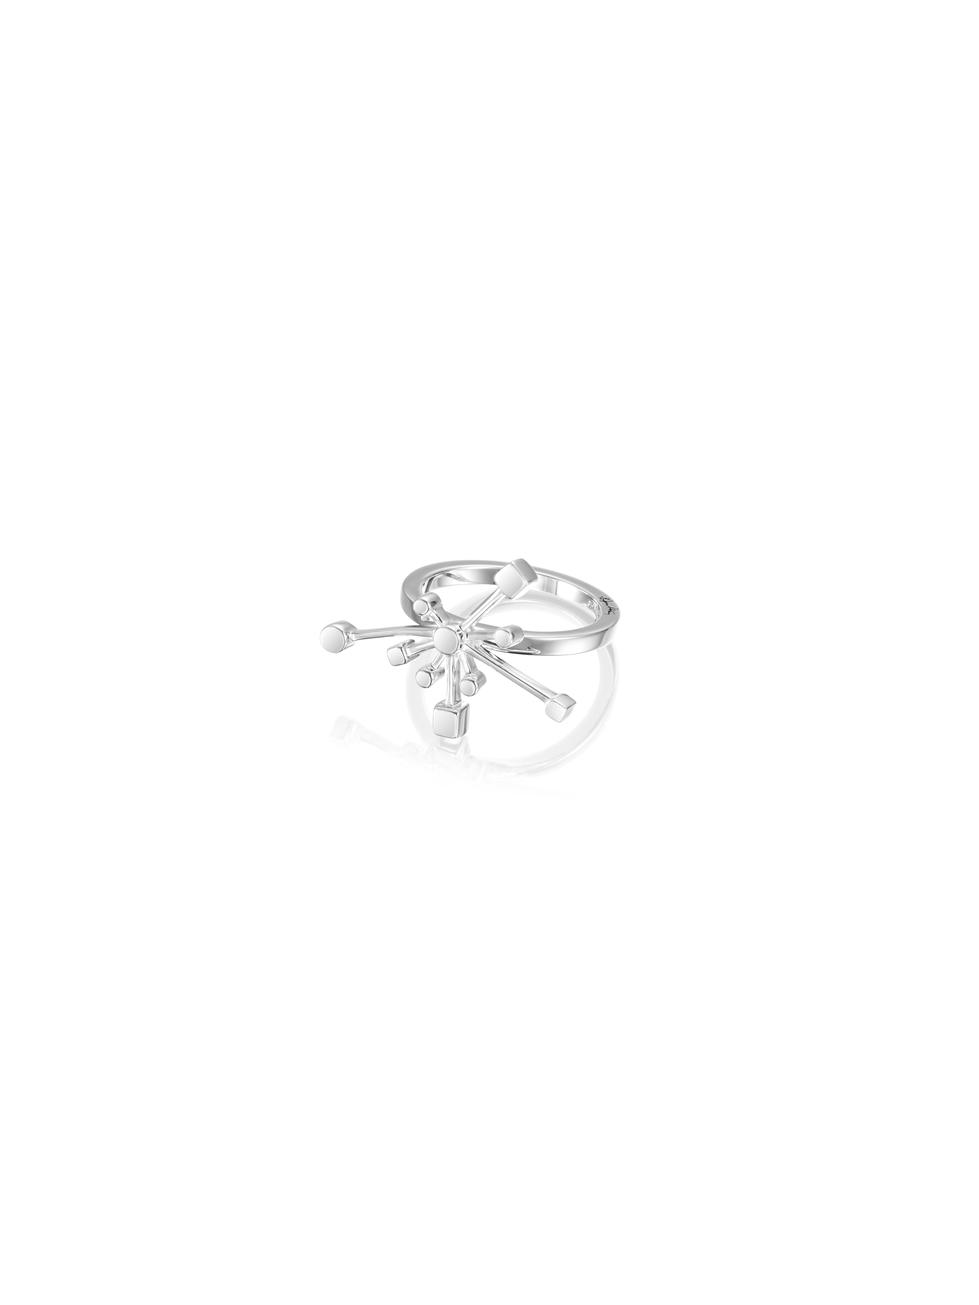 Little Kaboom Ring 13-100-01309(2)